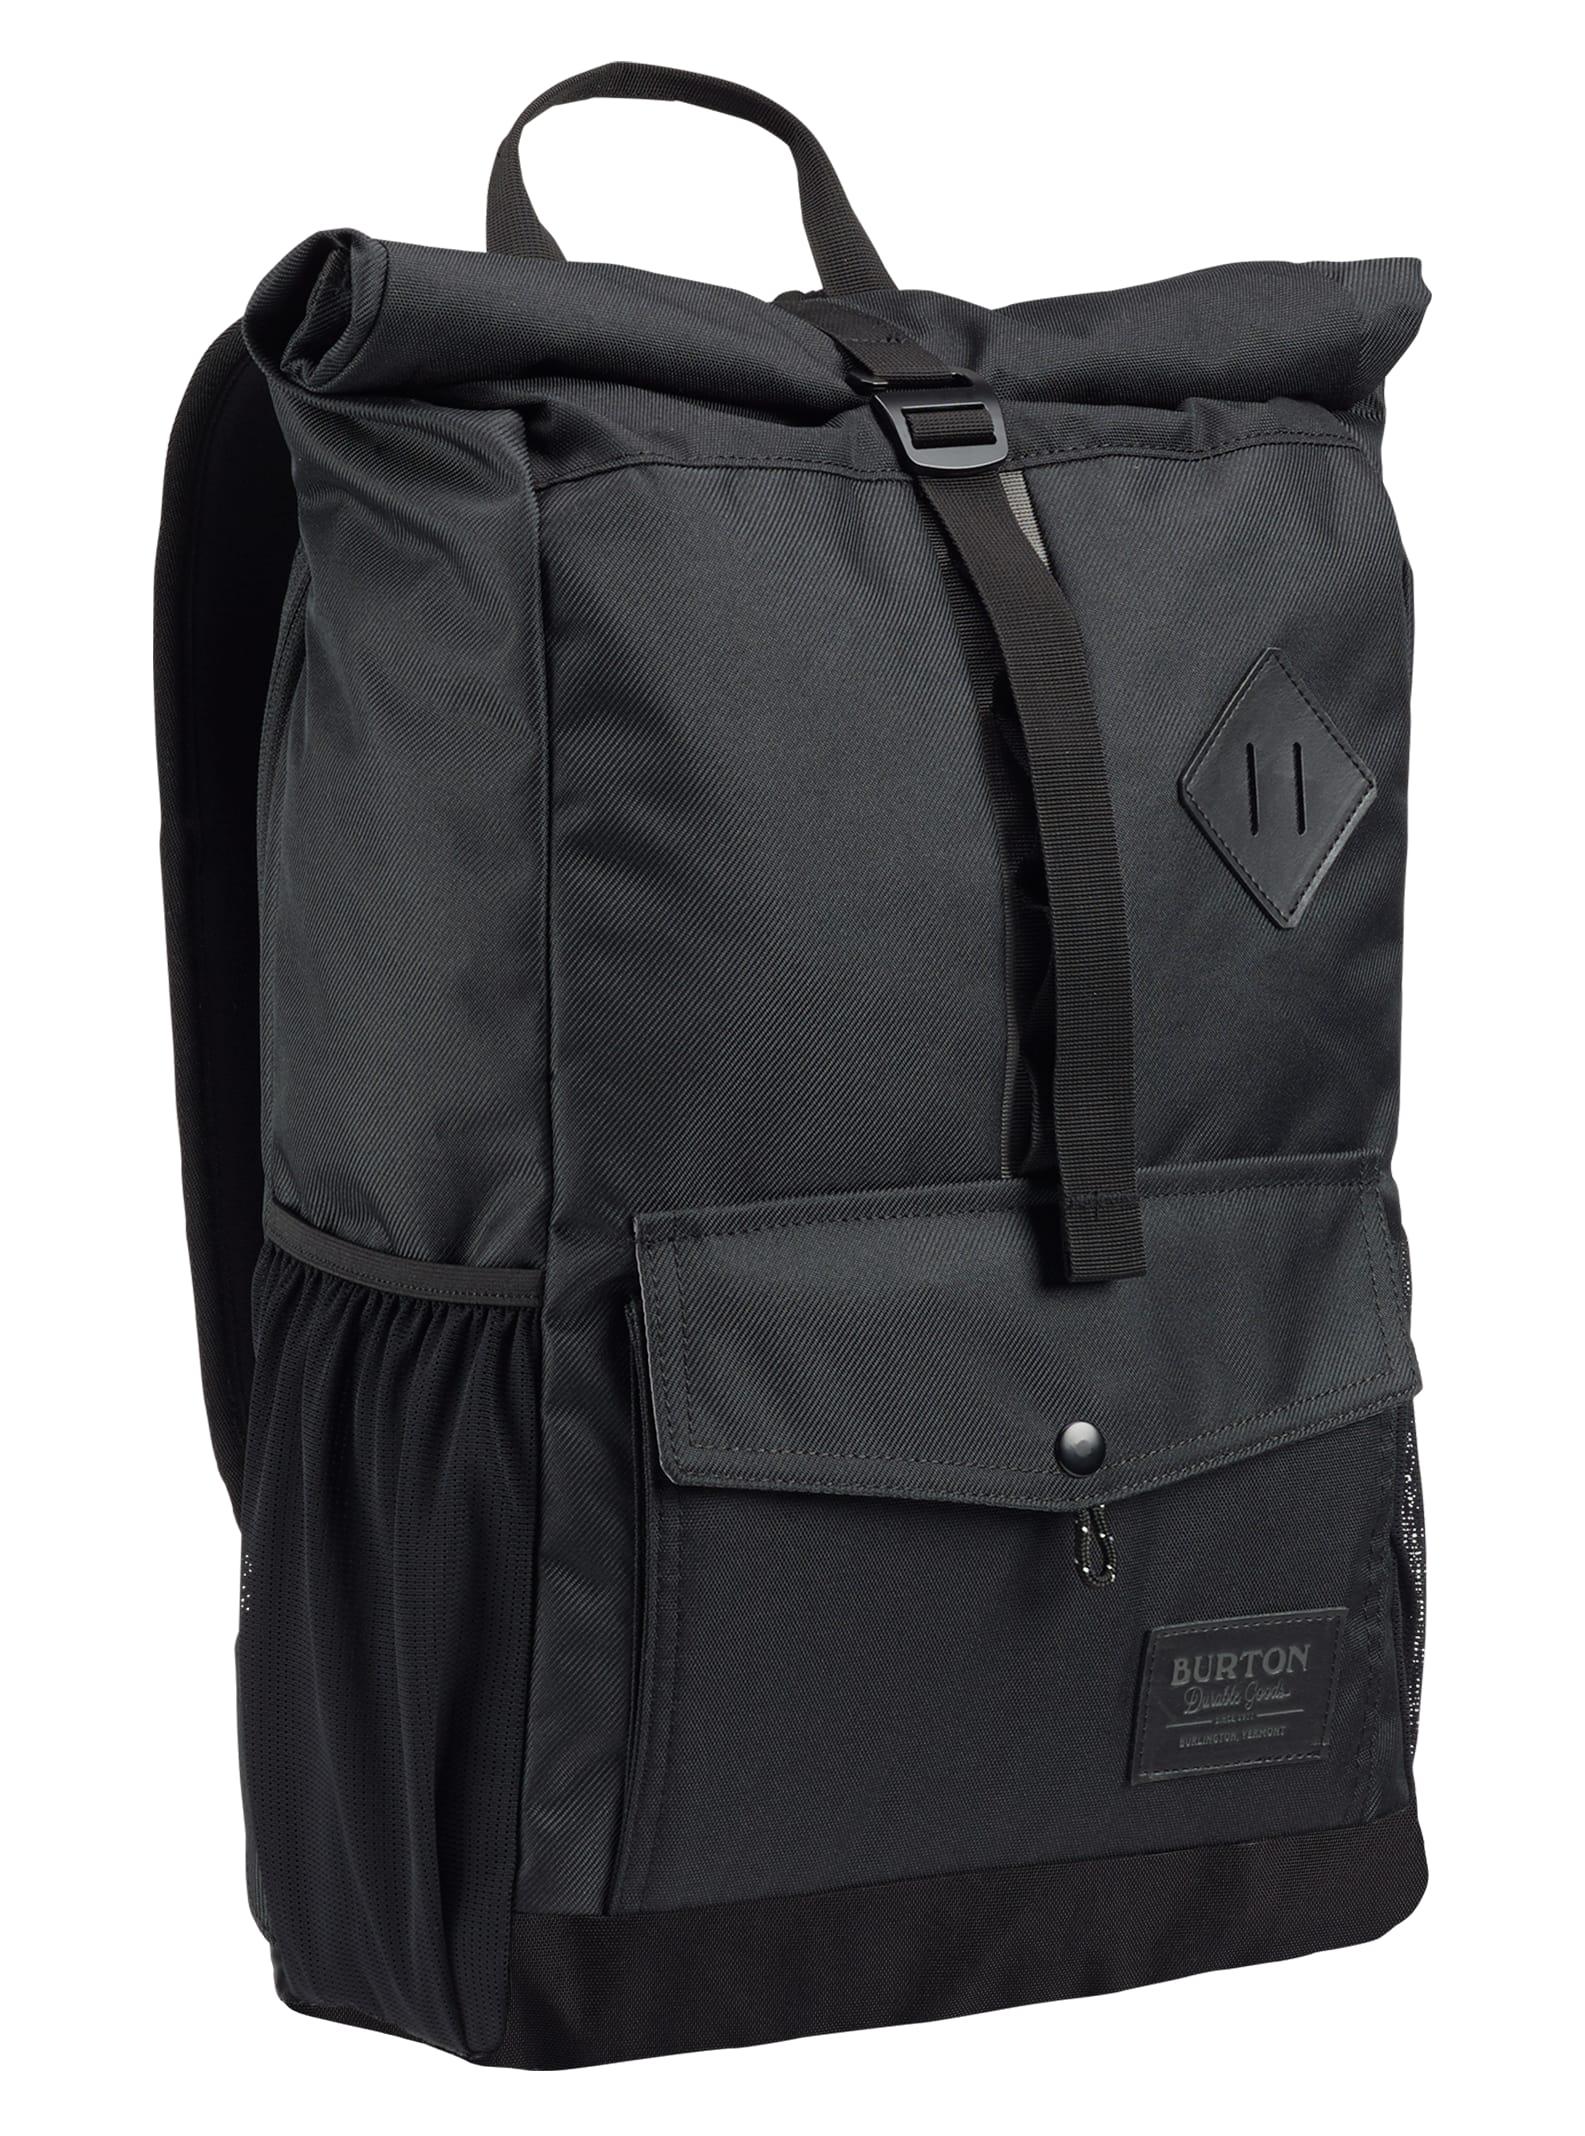 d8095297732 Backpacks   Burton Snowboards